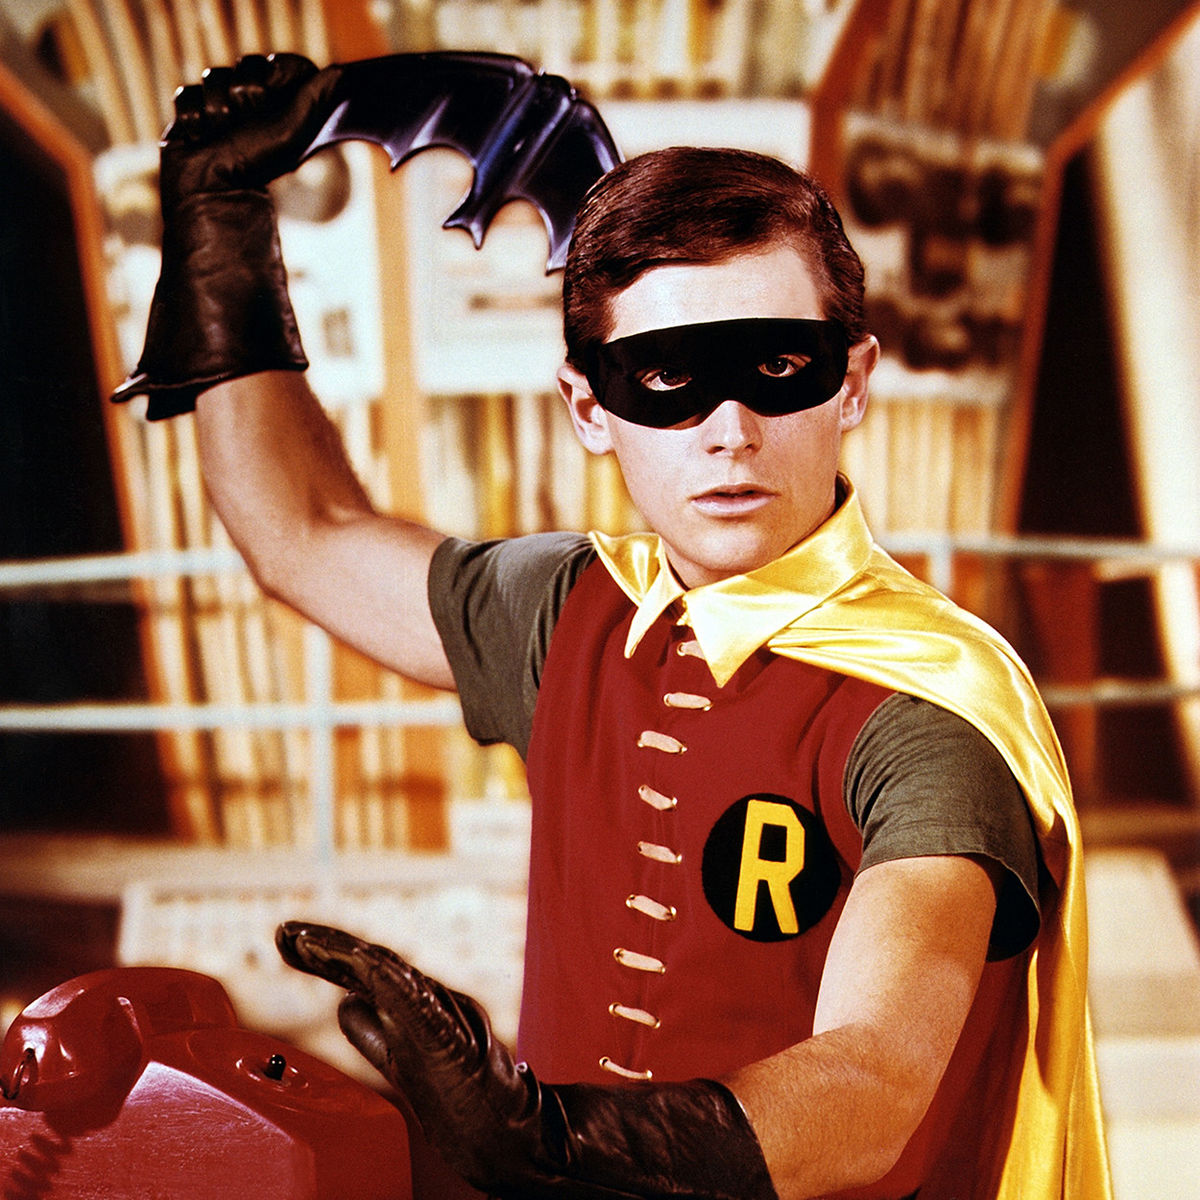 robin_with_batarang_1250.jpg